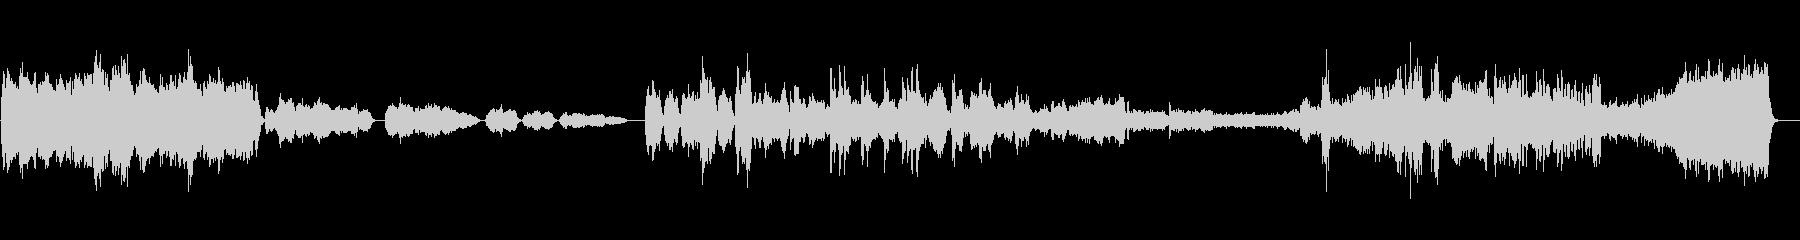 【CMで聴くクラシック】弦楽セレナーデの未再生の波形